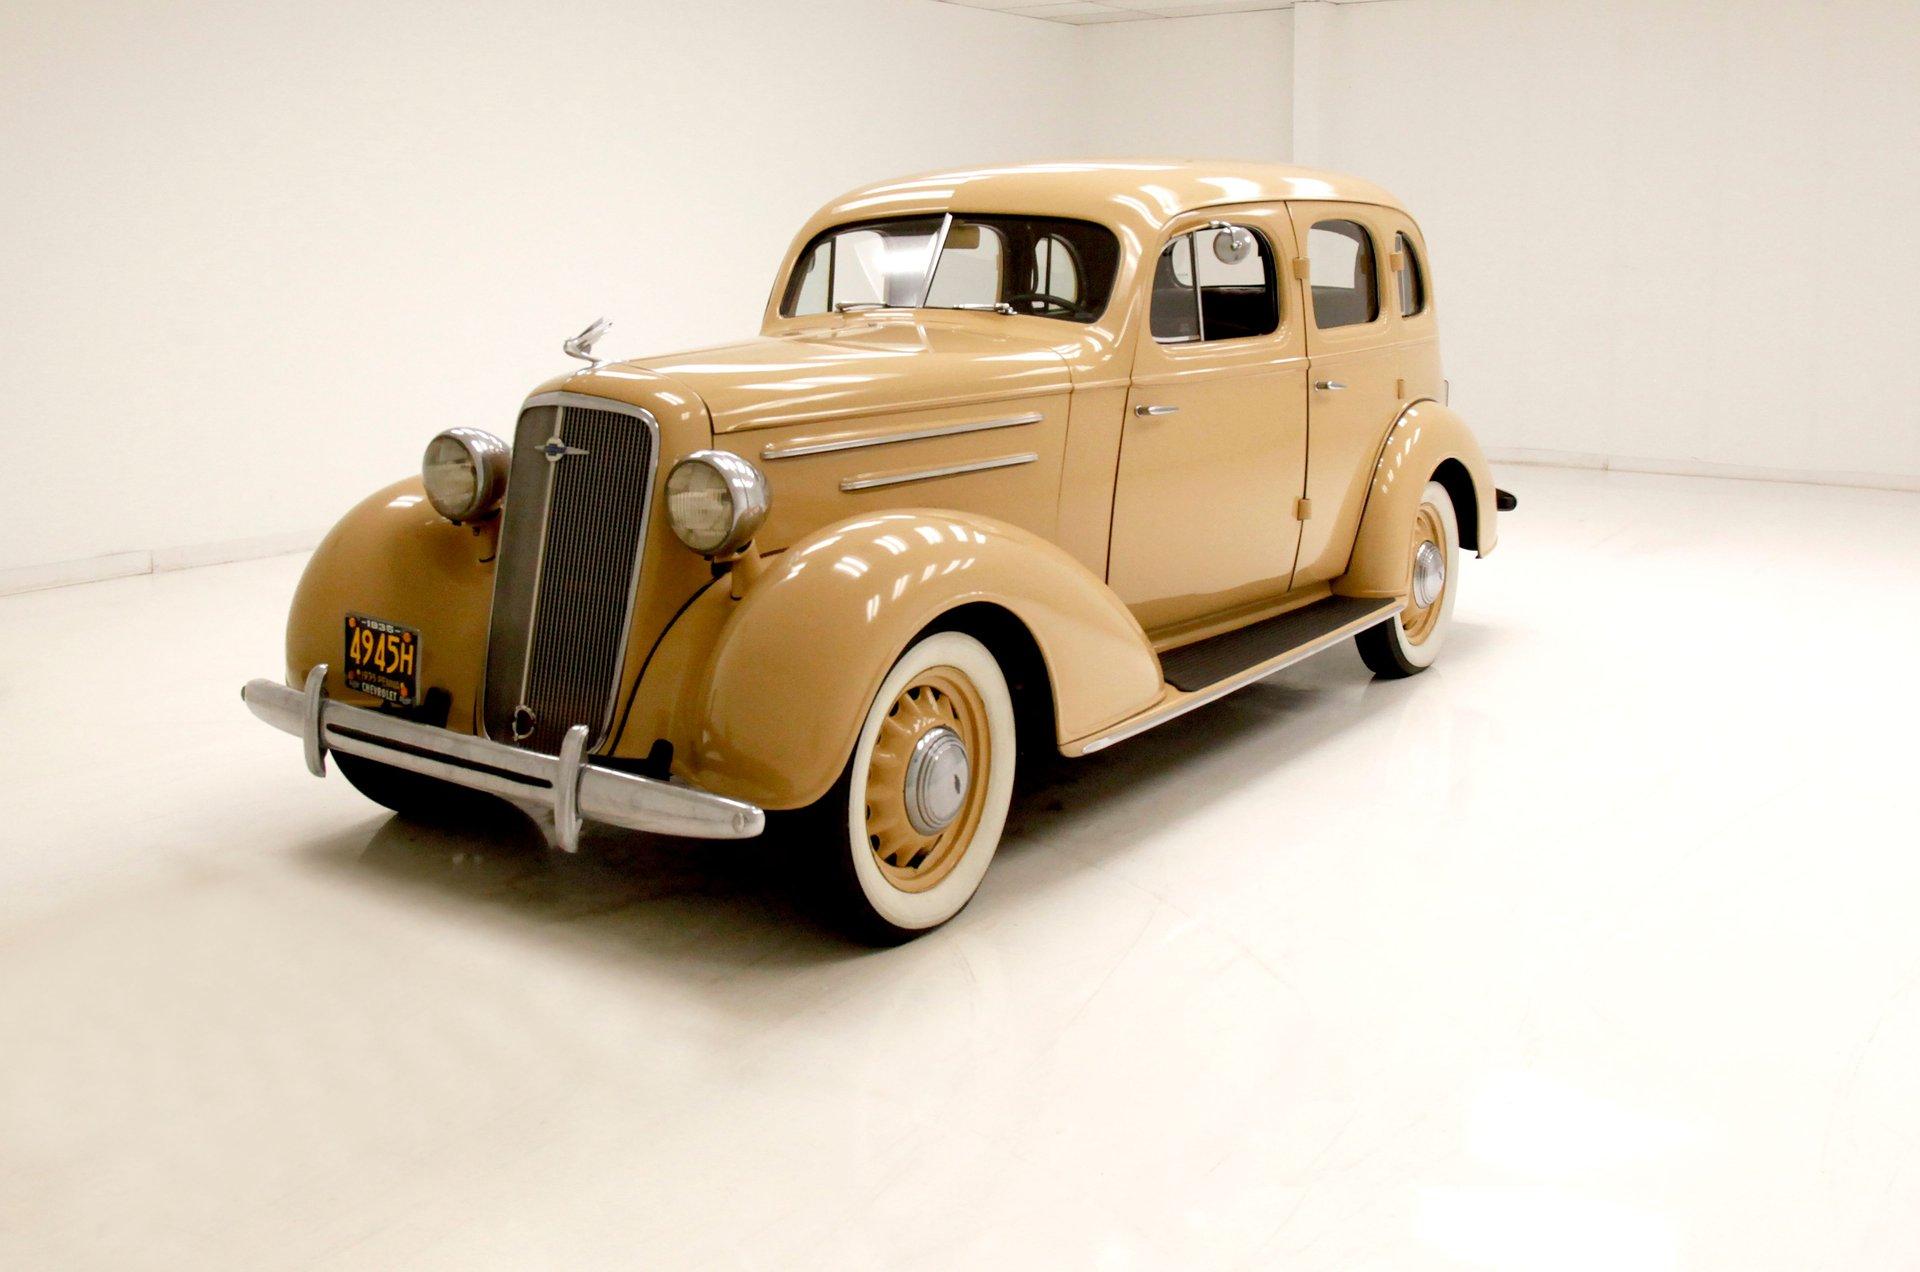 1935 Chevrolet Master Deluxe